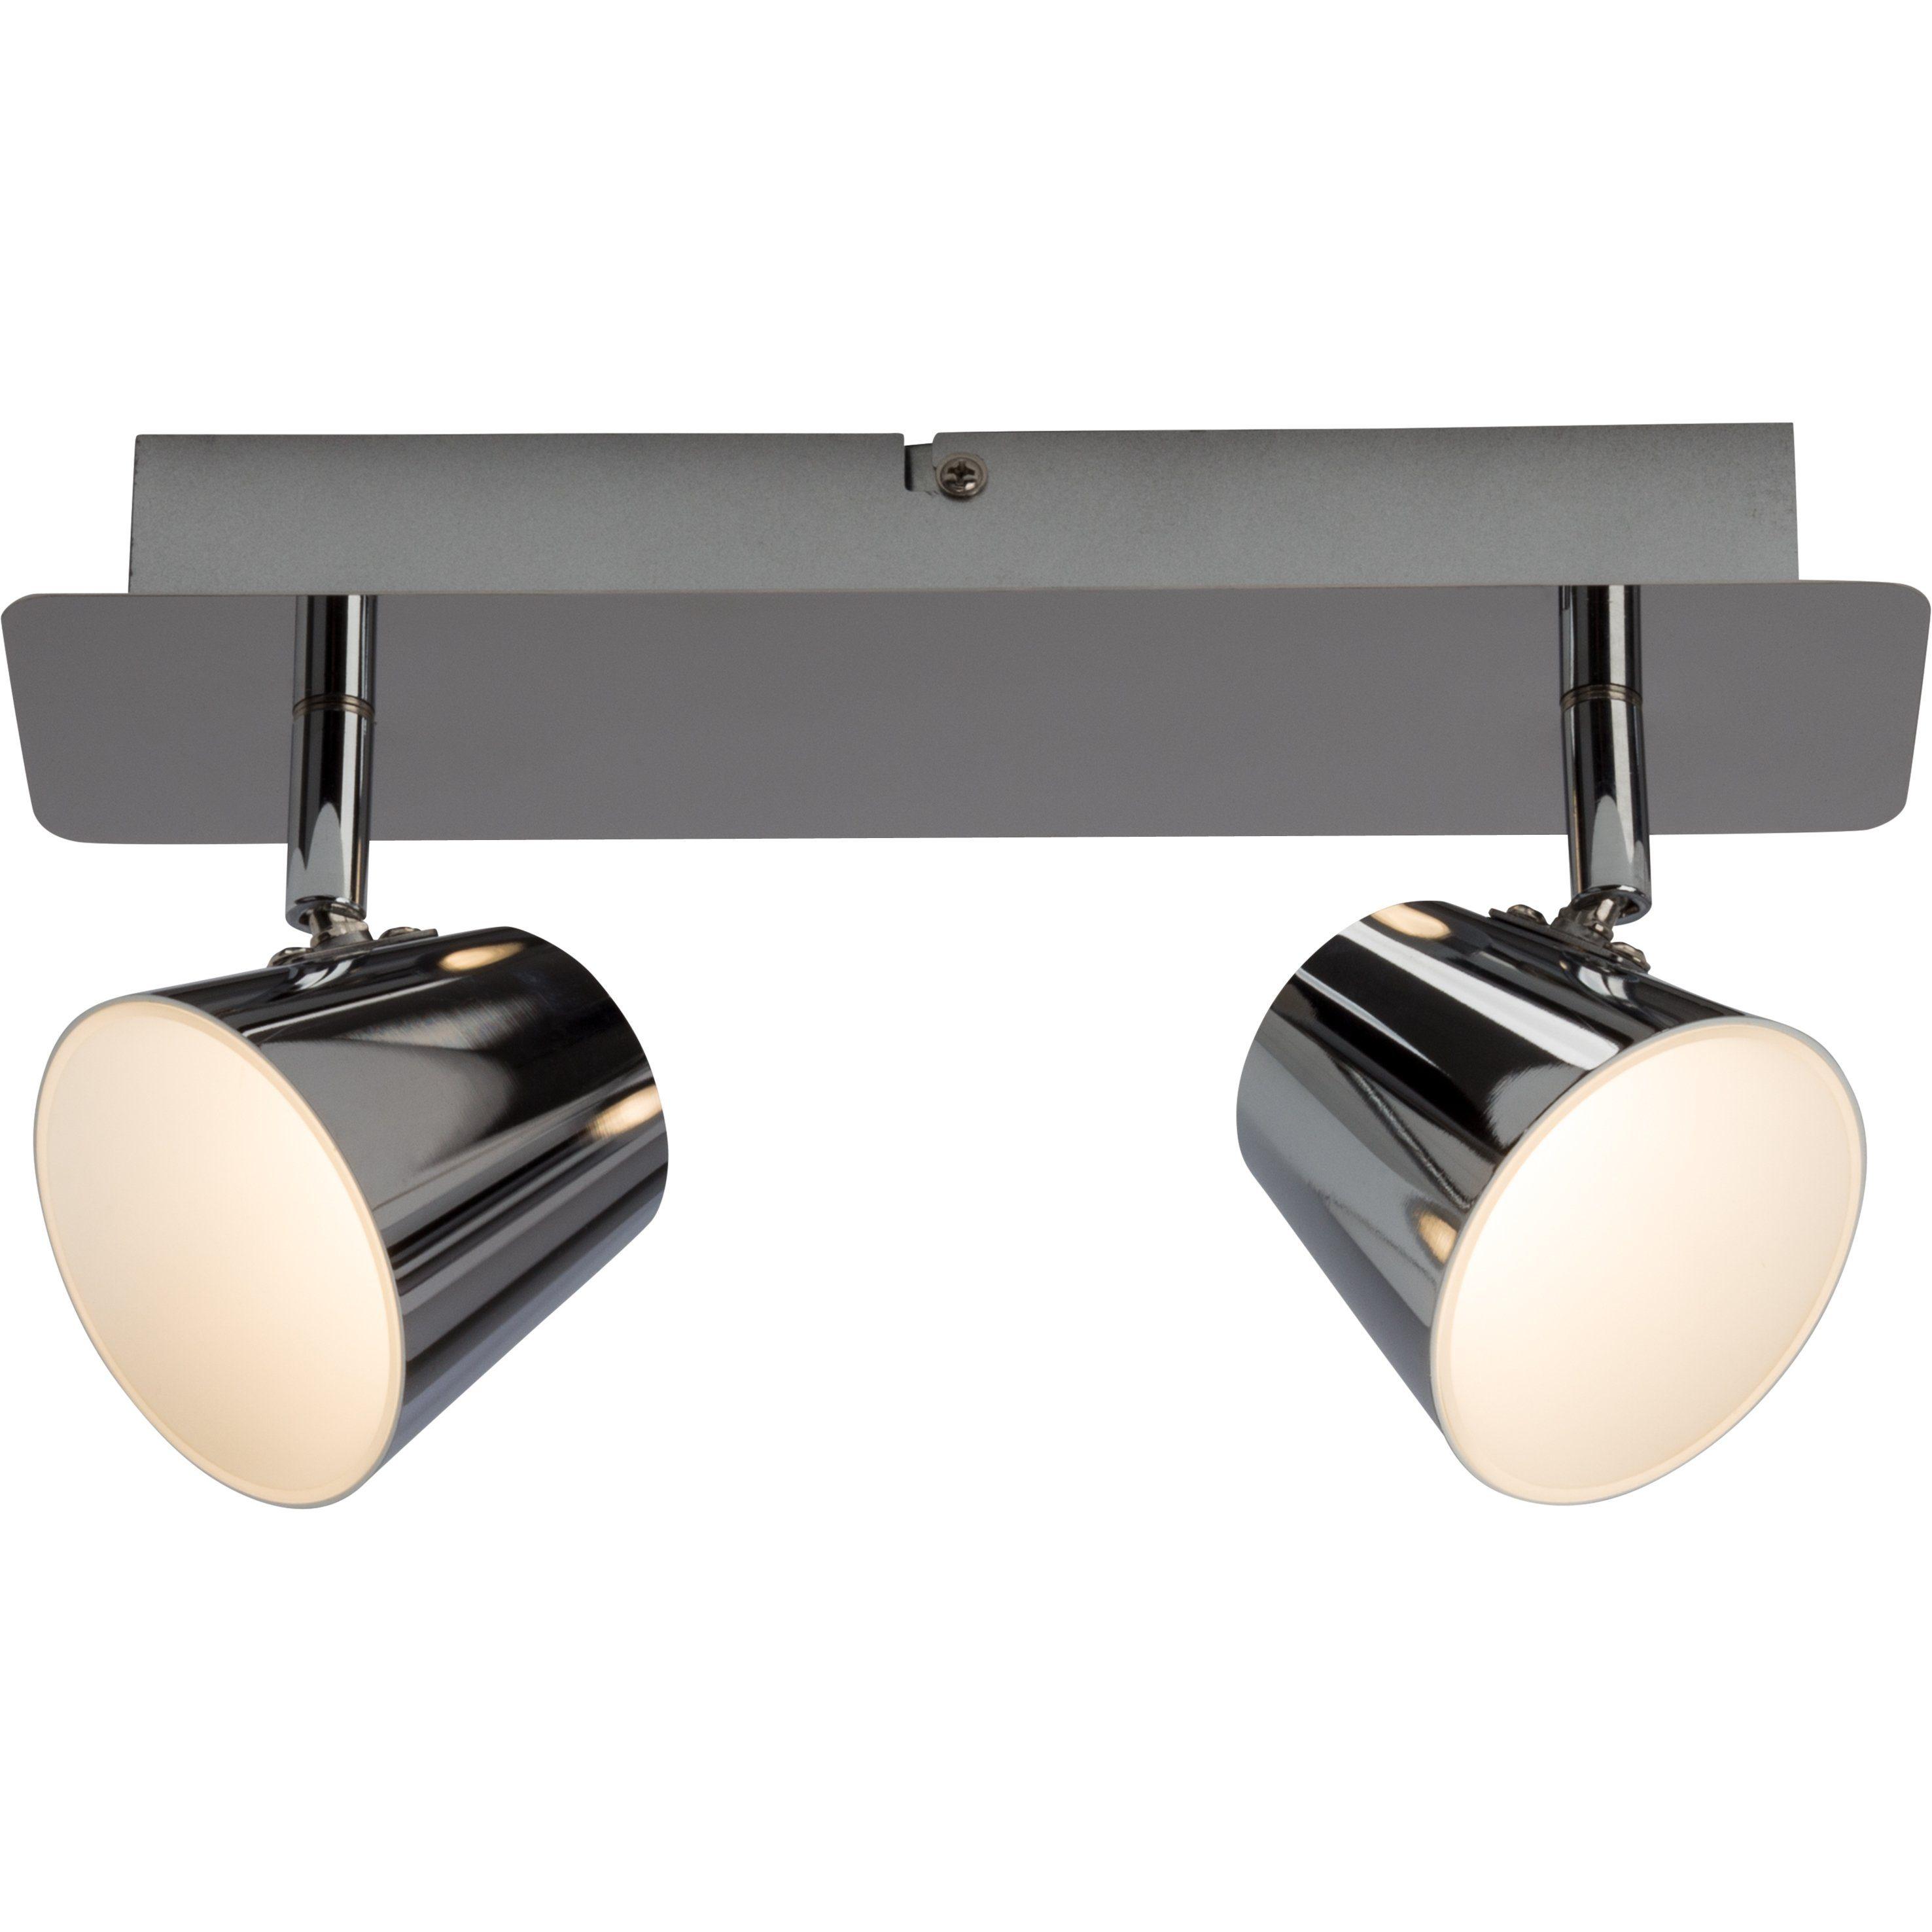 Brilliant Leuchten Torsion LED Spotbalken, 2-flammig chrom